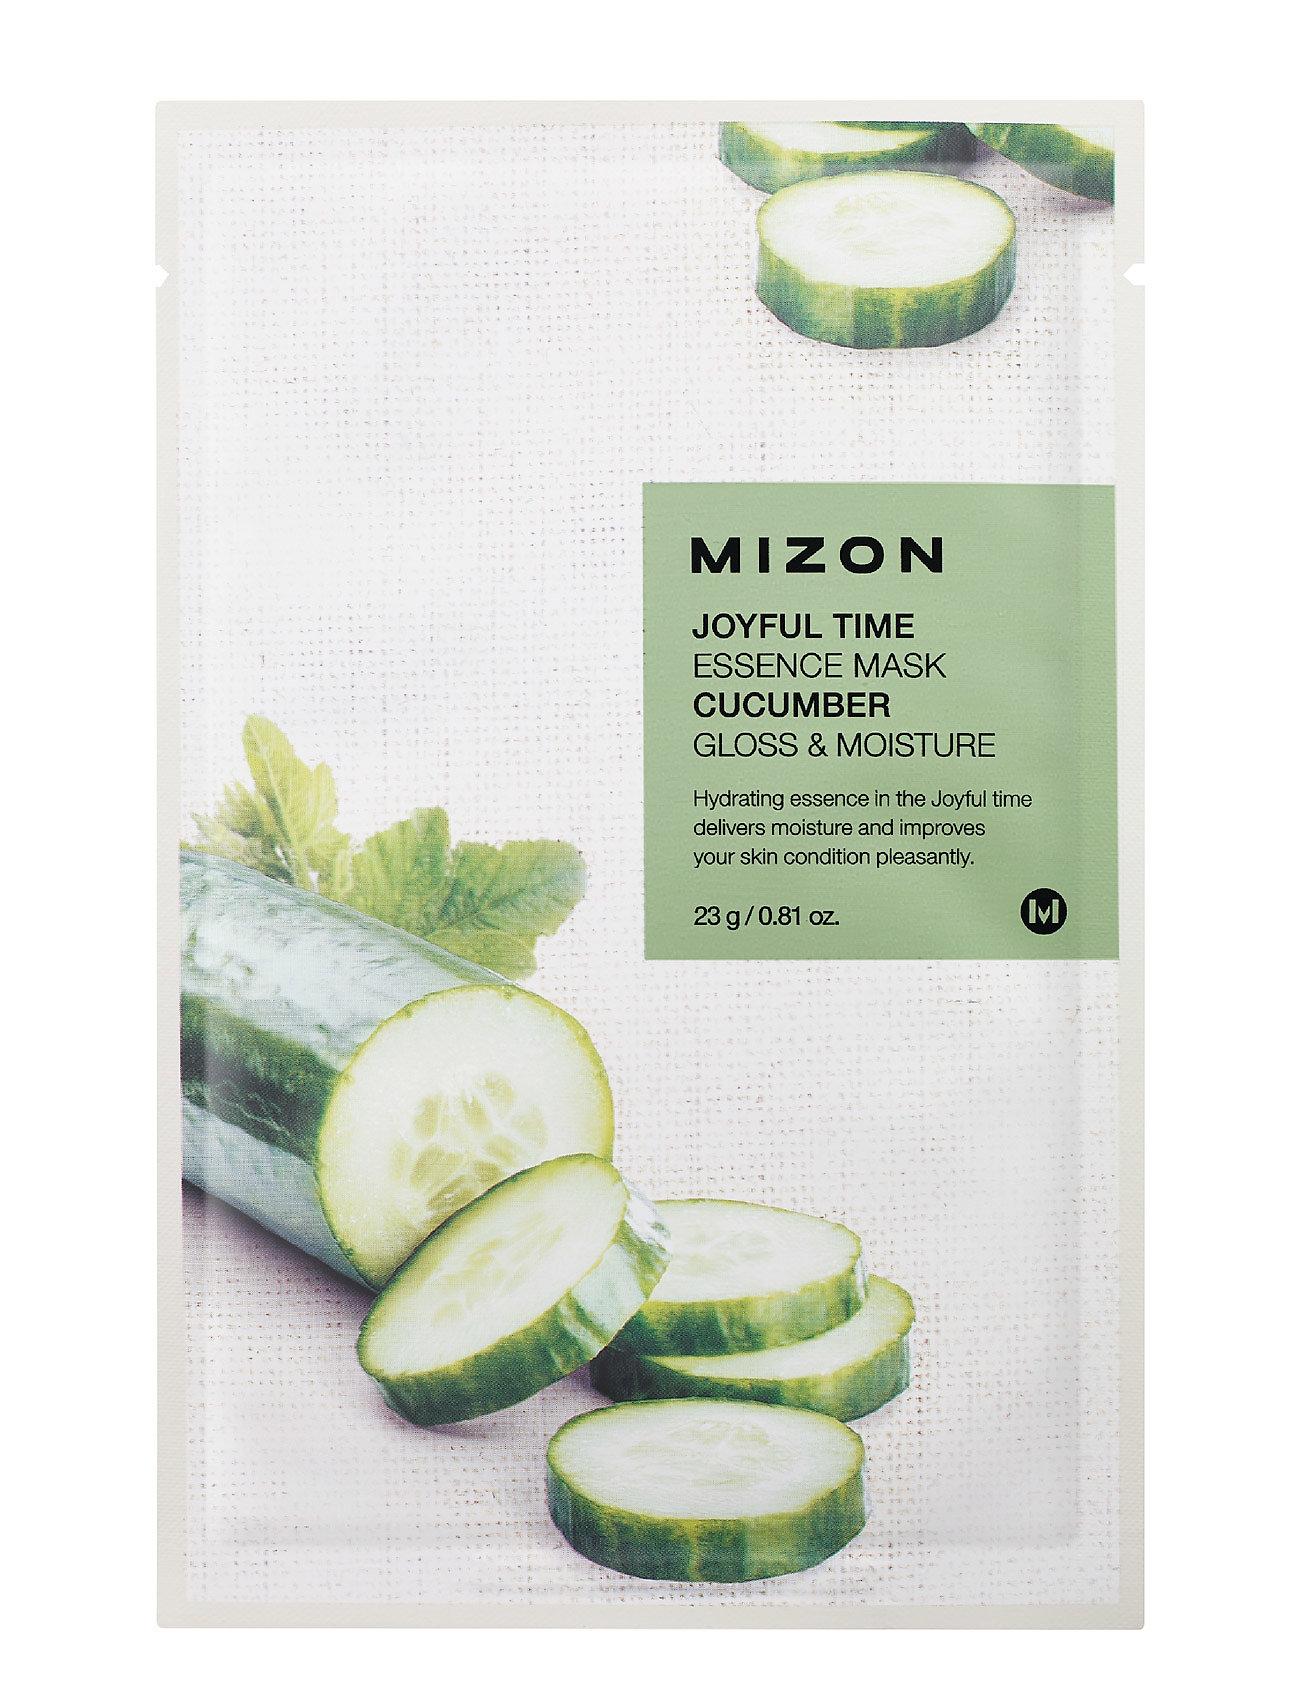 MIZON Joyful Time Mask Cucumber - CLEAR